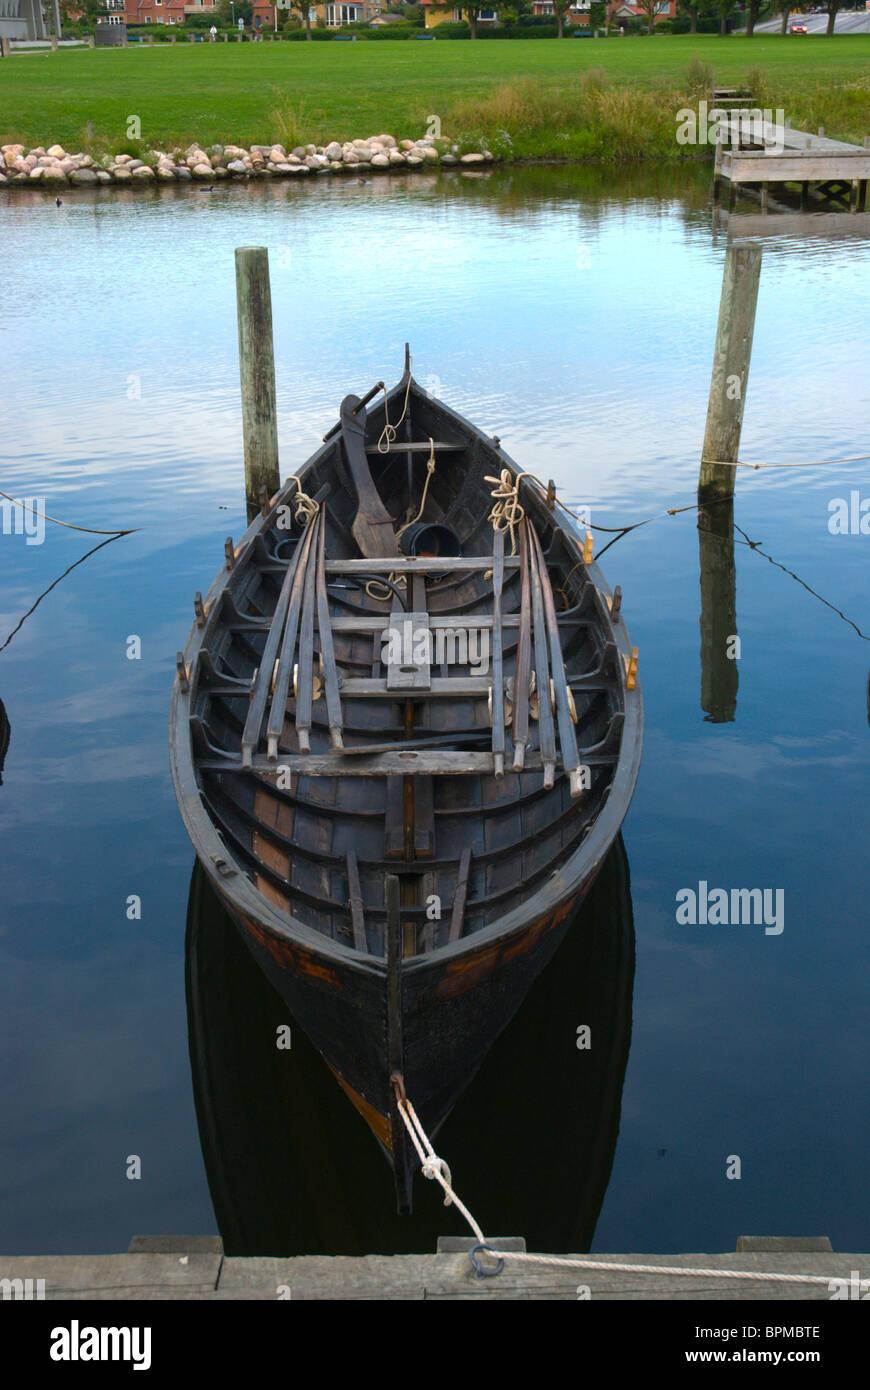 Replica of Krakan viking boat from Faroe island at Fjord of Roskilde Denmark Europe - Stock Image